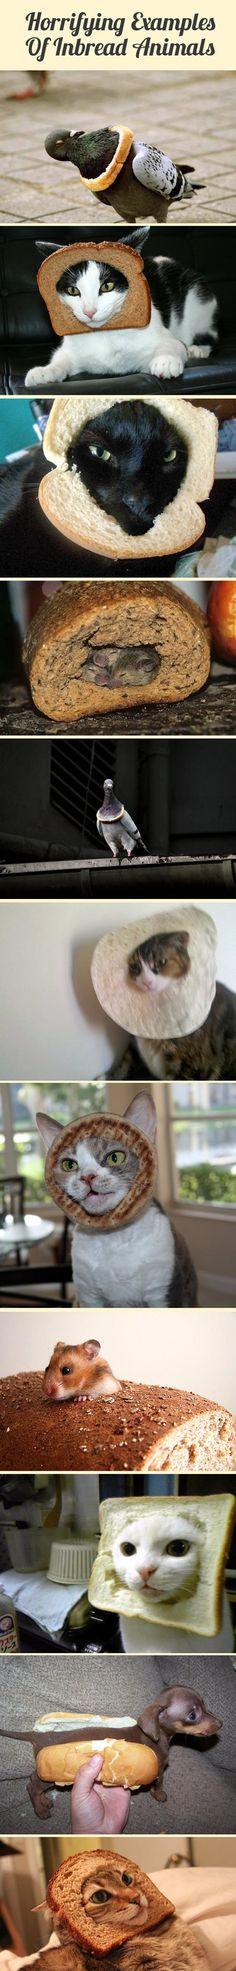 Horrifying examples of inbread animals.